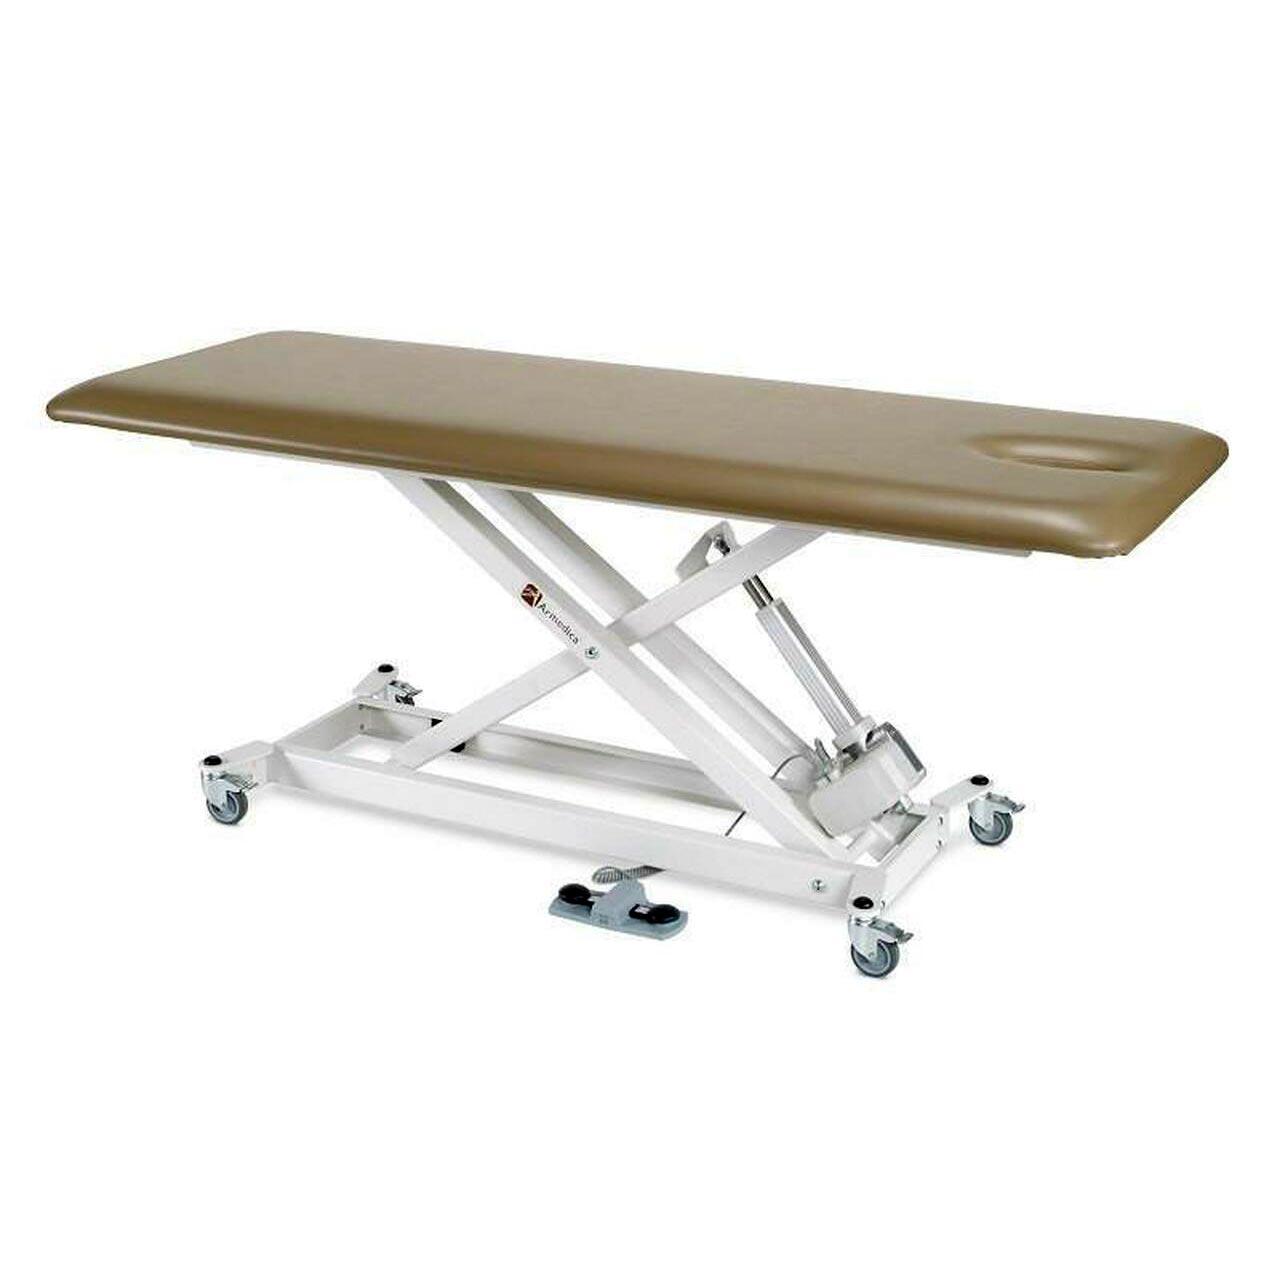 Armedica AM-SX 1000 treatment table